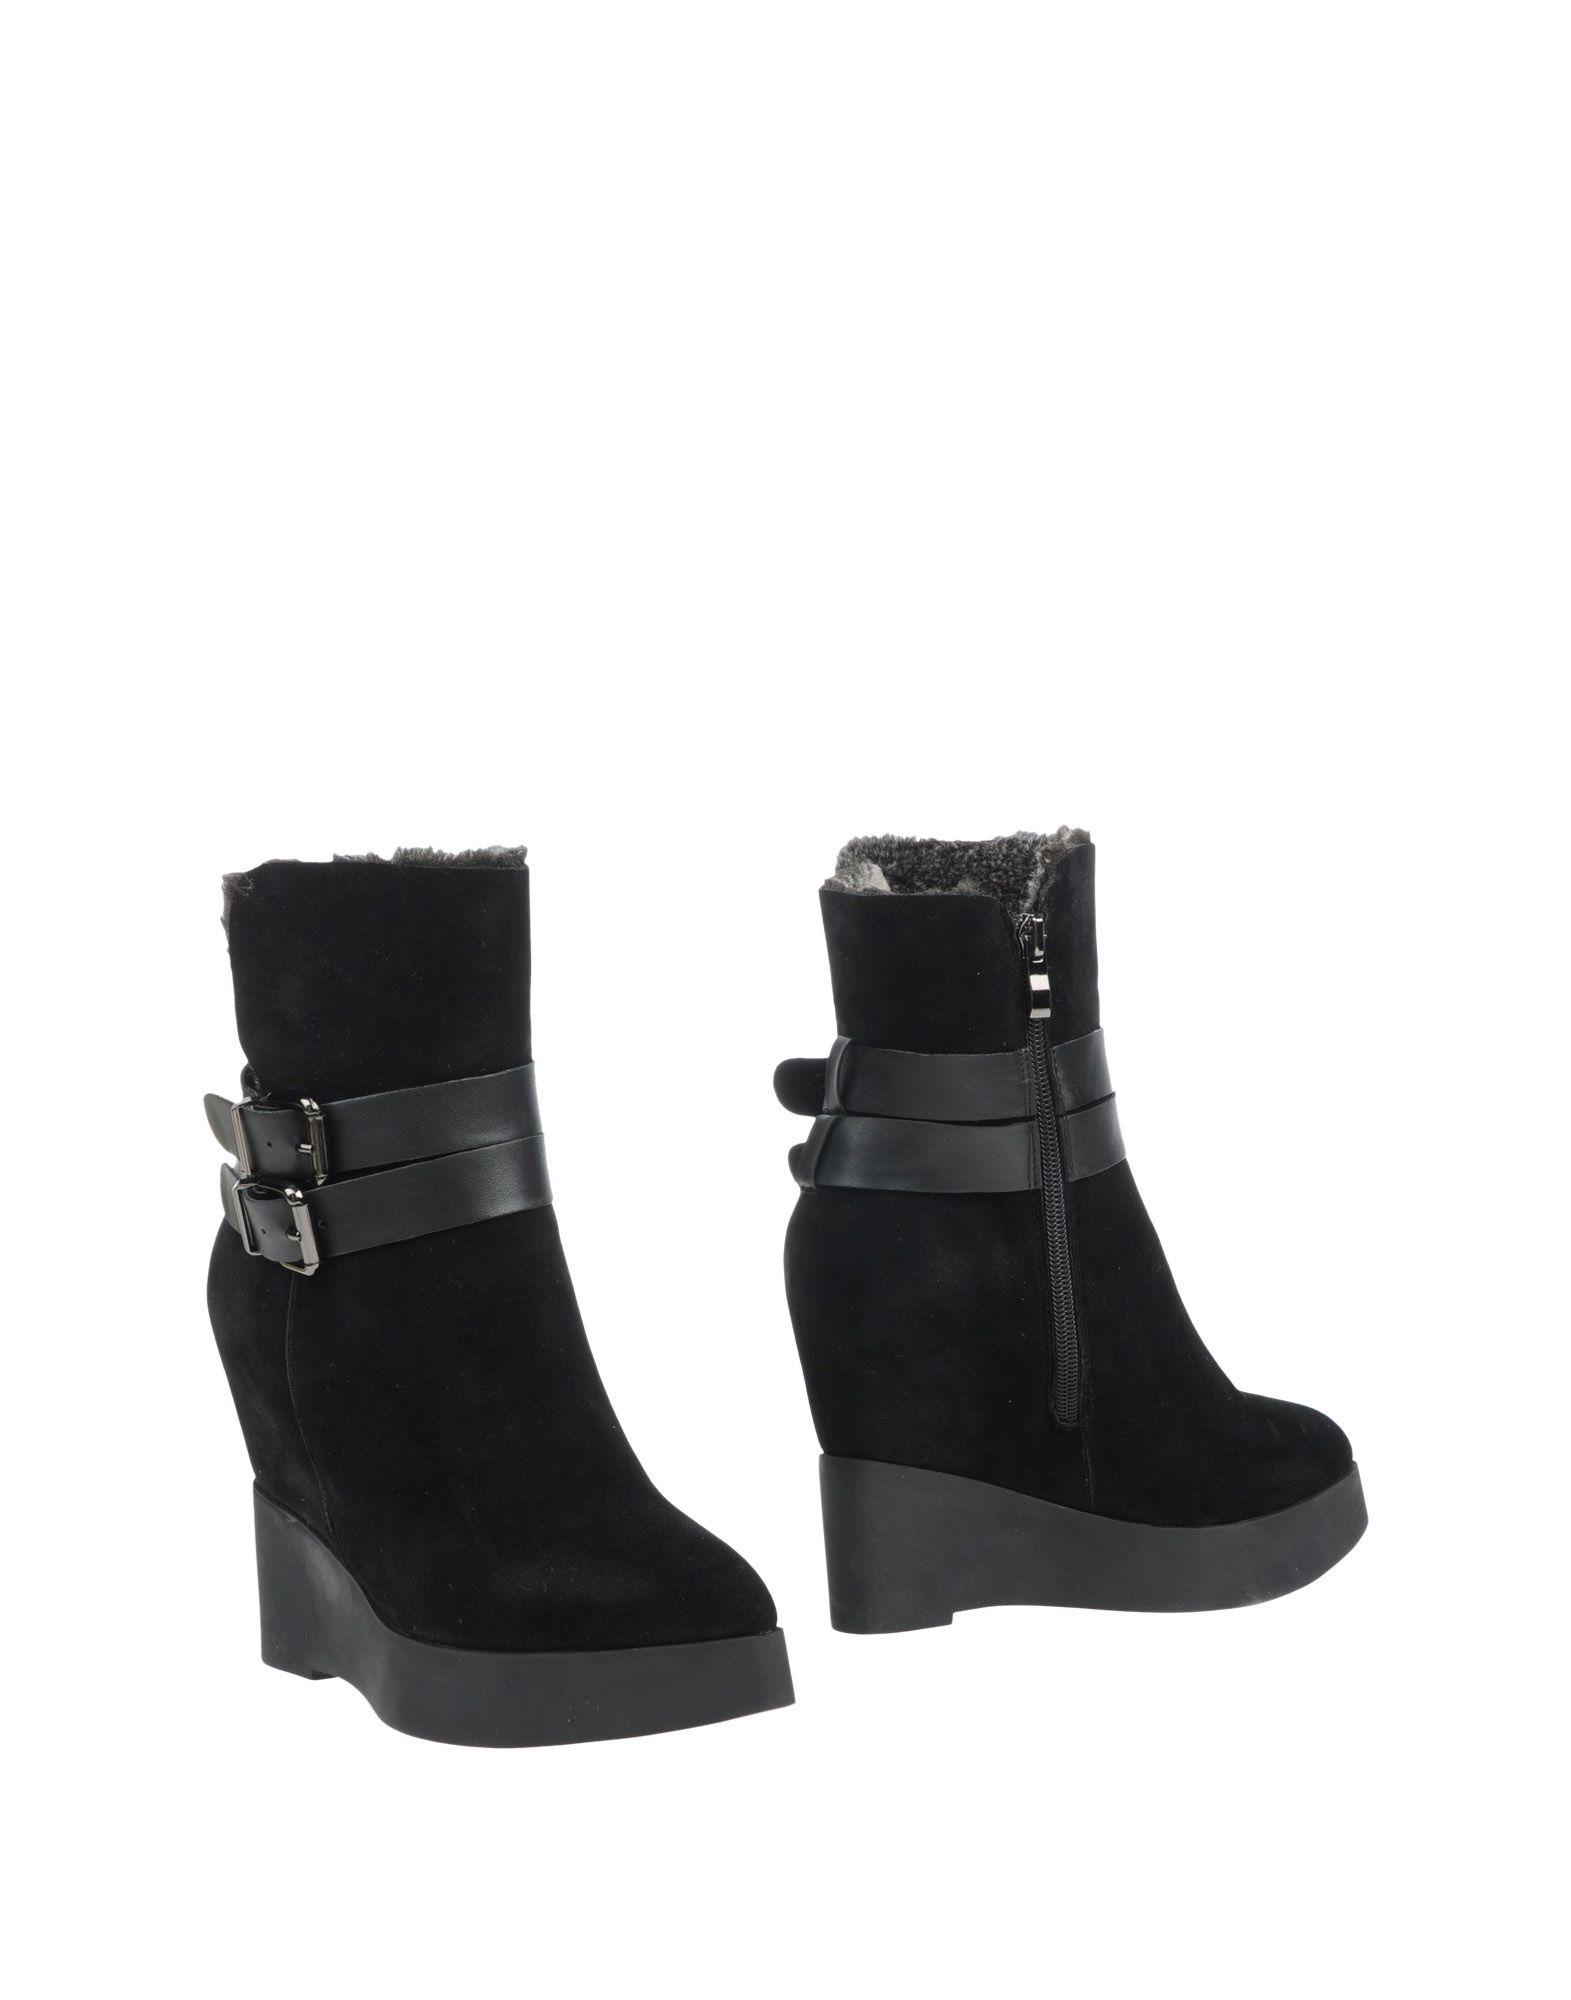 Bibi Lou Lou Bibi Stiefelette Damen  44809833HV Gute Qualität beliebte Schuhe d292de